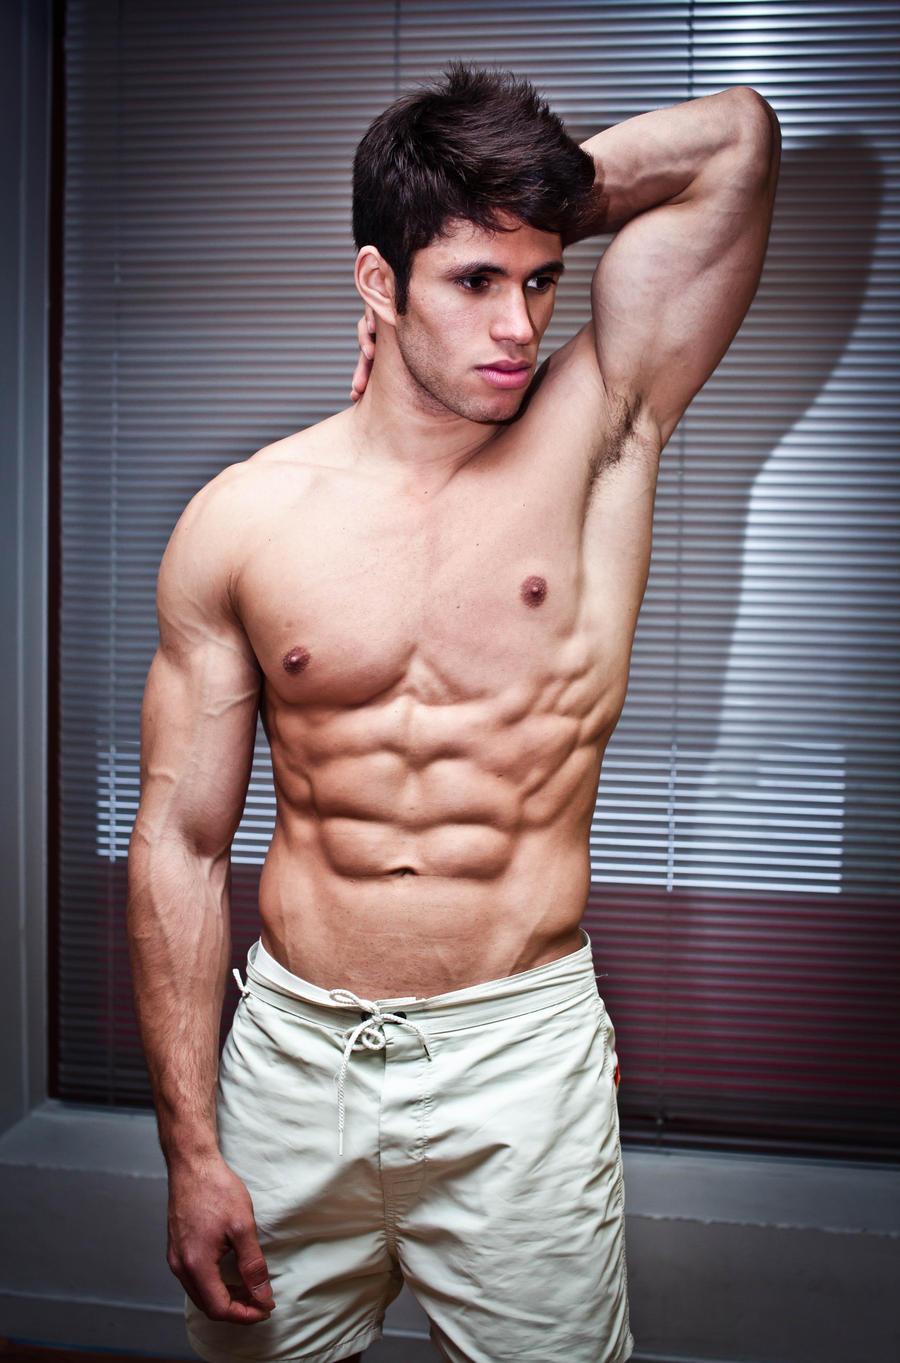 Fitness man by RLPhotographs